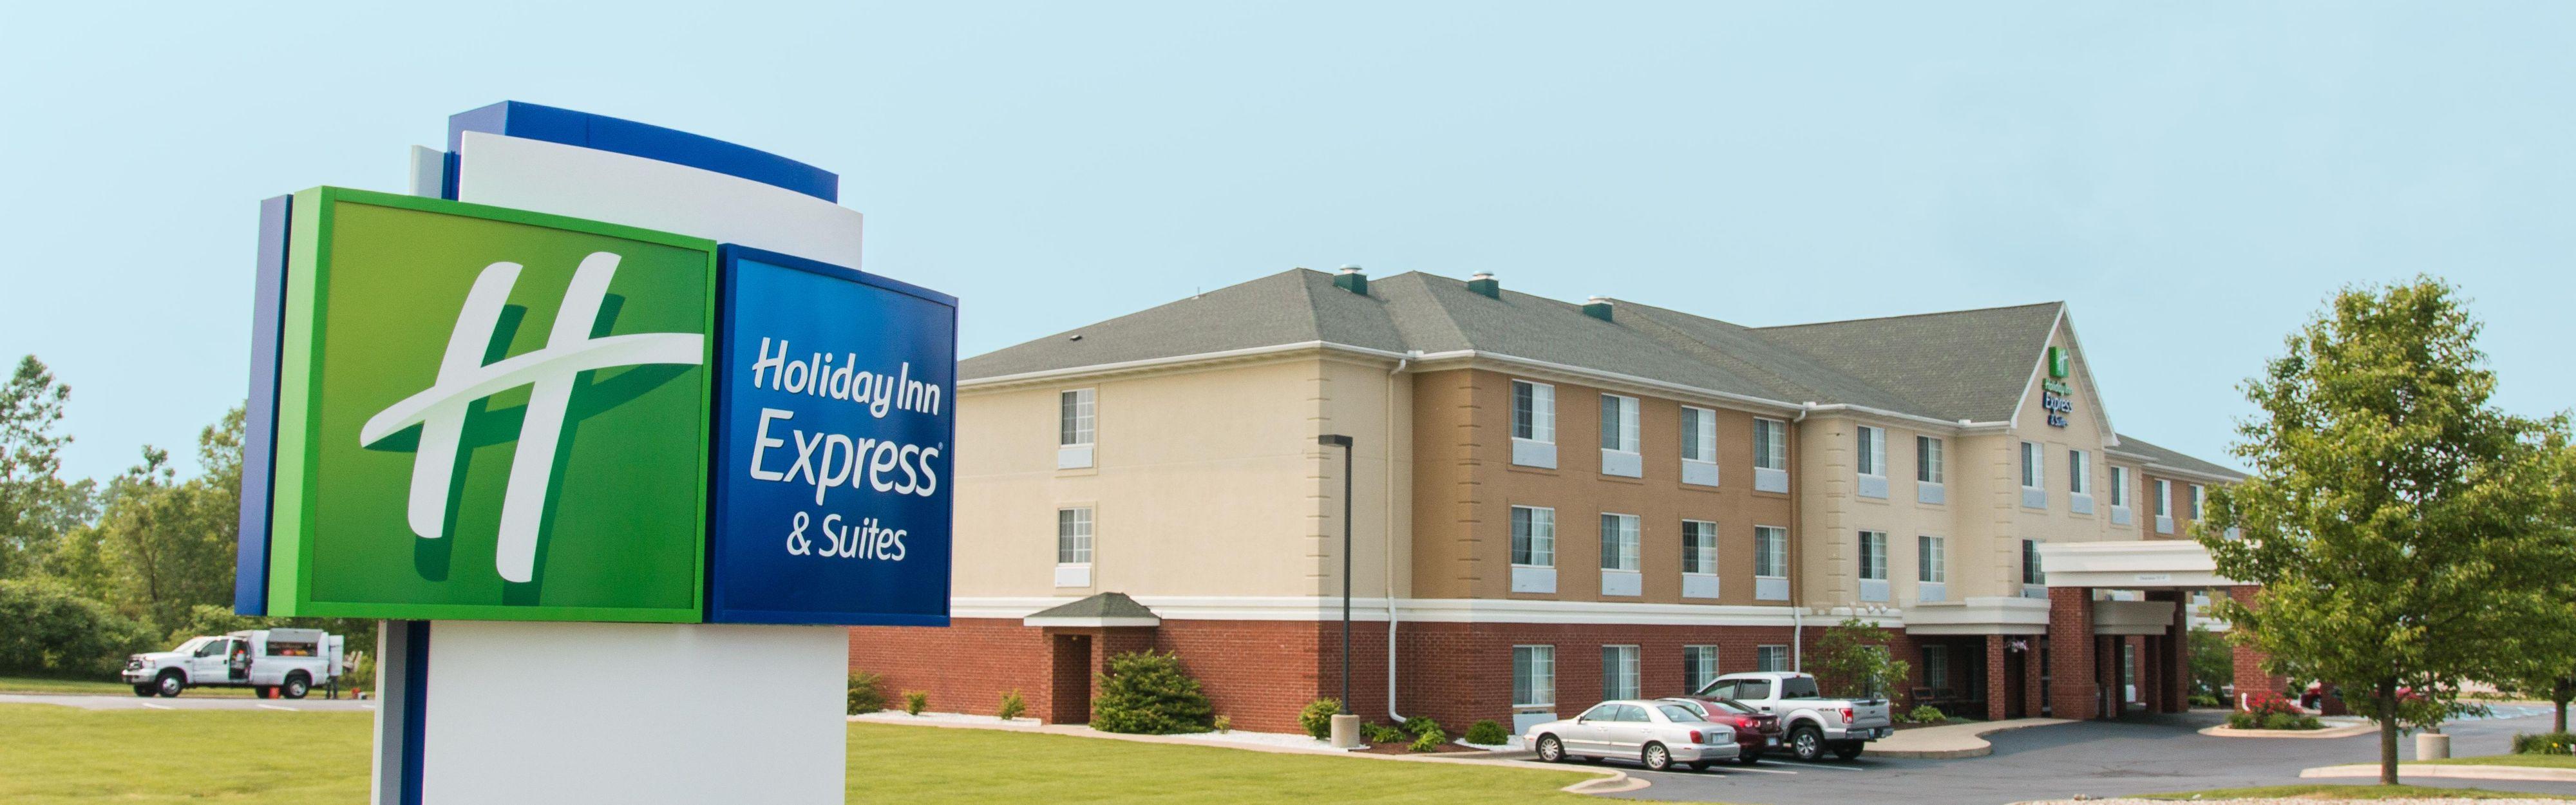 Holiday Inn Express & Suites Jackson image 0